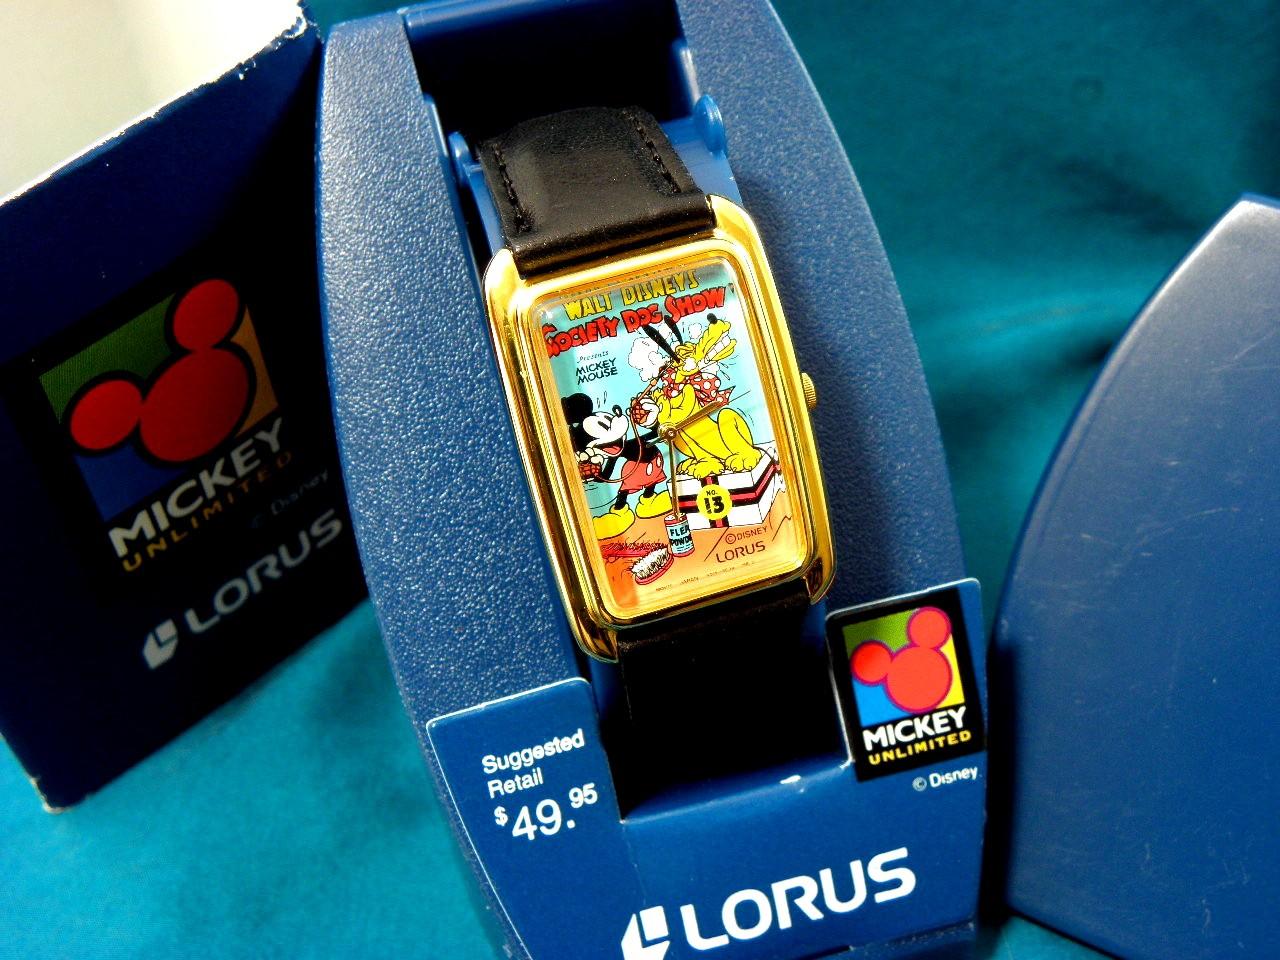 Vintage Bradley Disney Watches